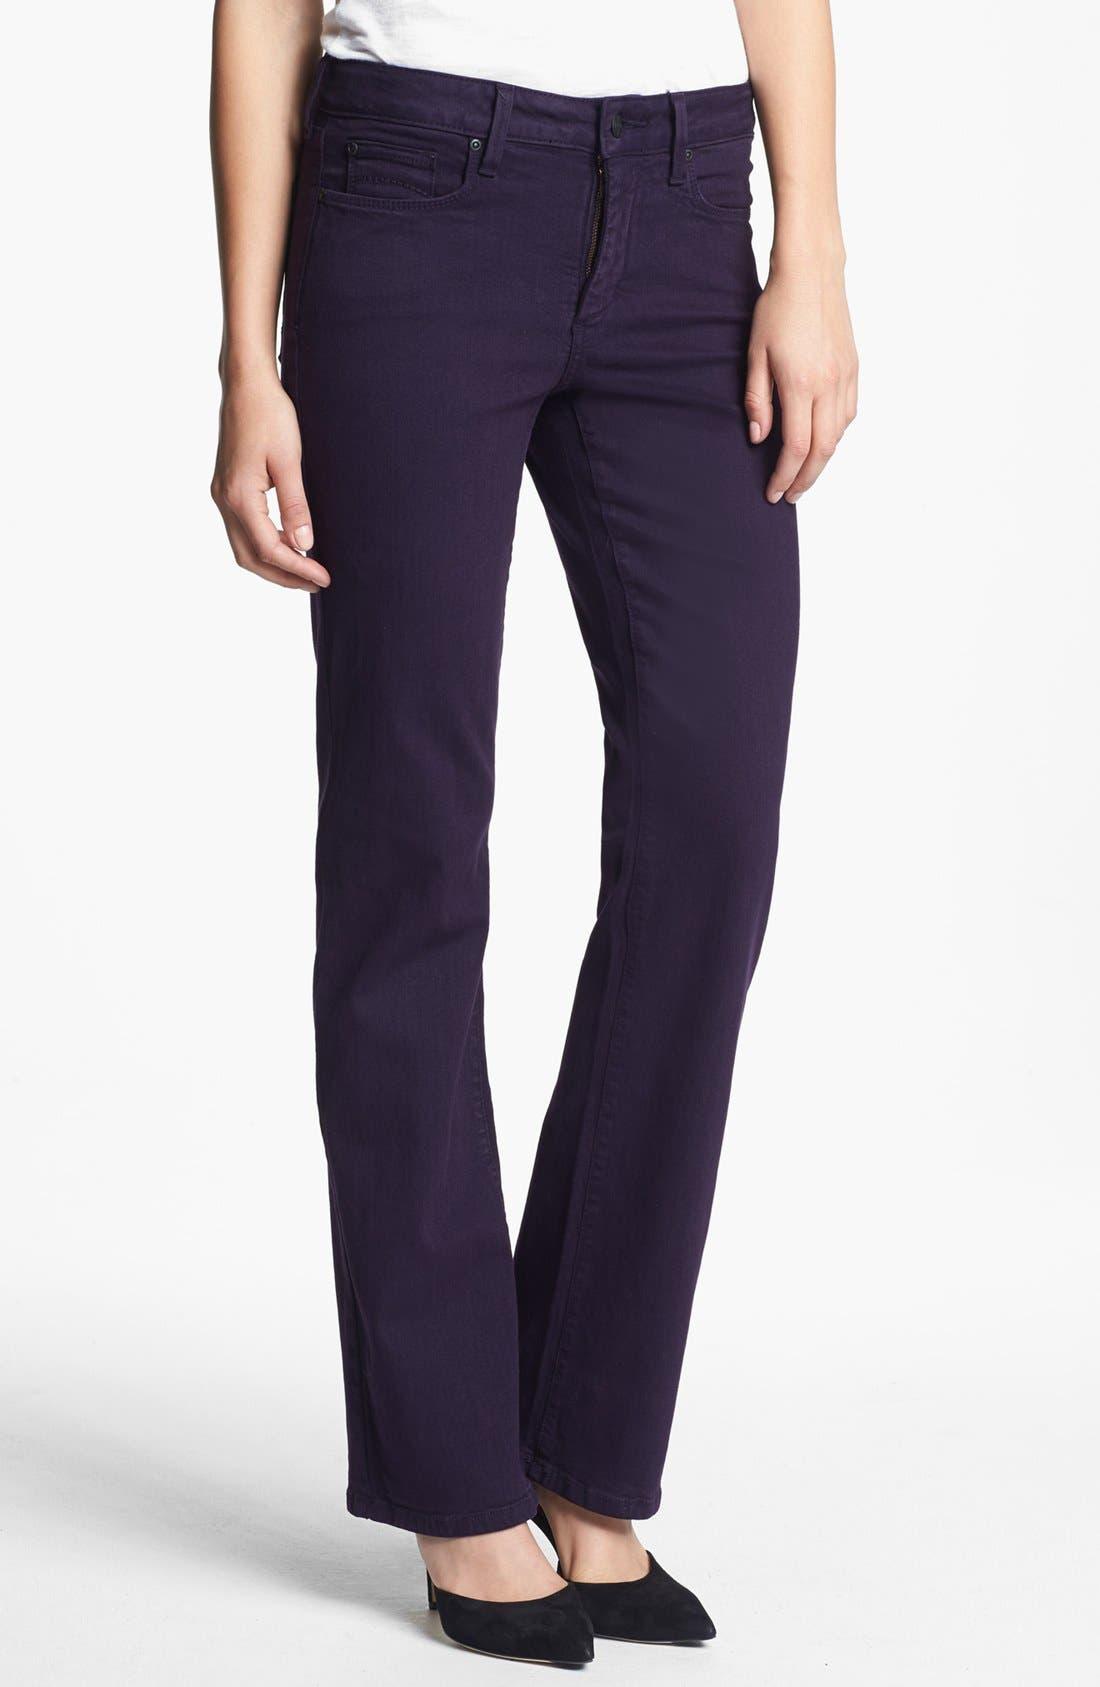 Main Image - NYDJ 'Barbara' Colored Stretch Bootcut Jeans